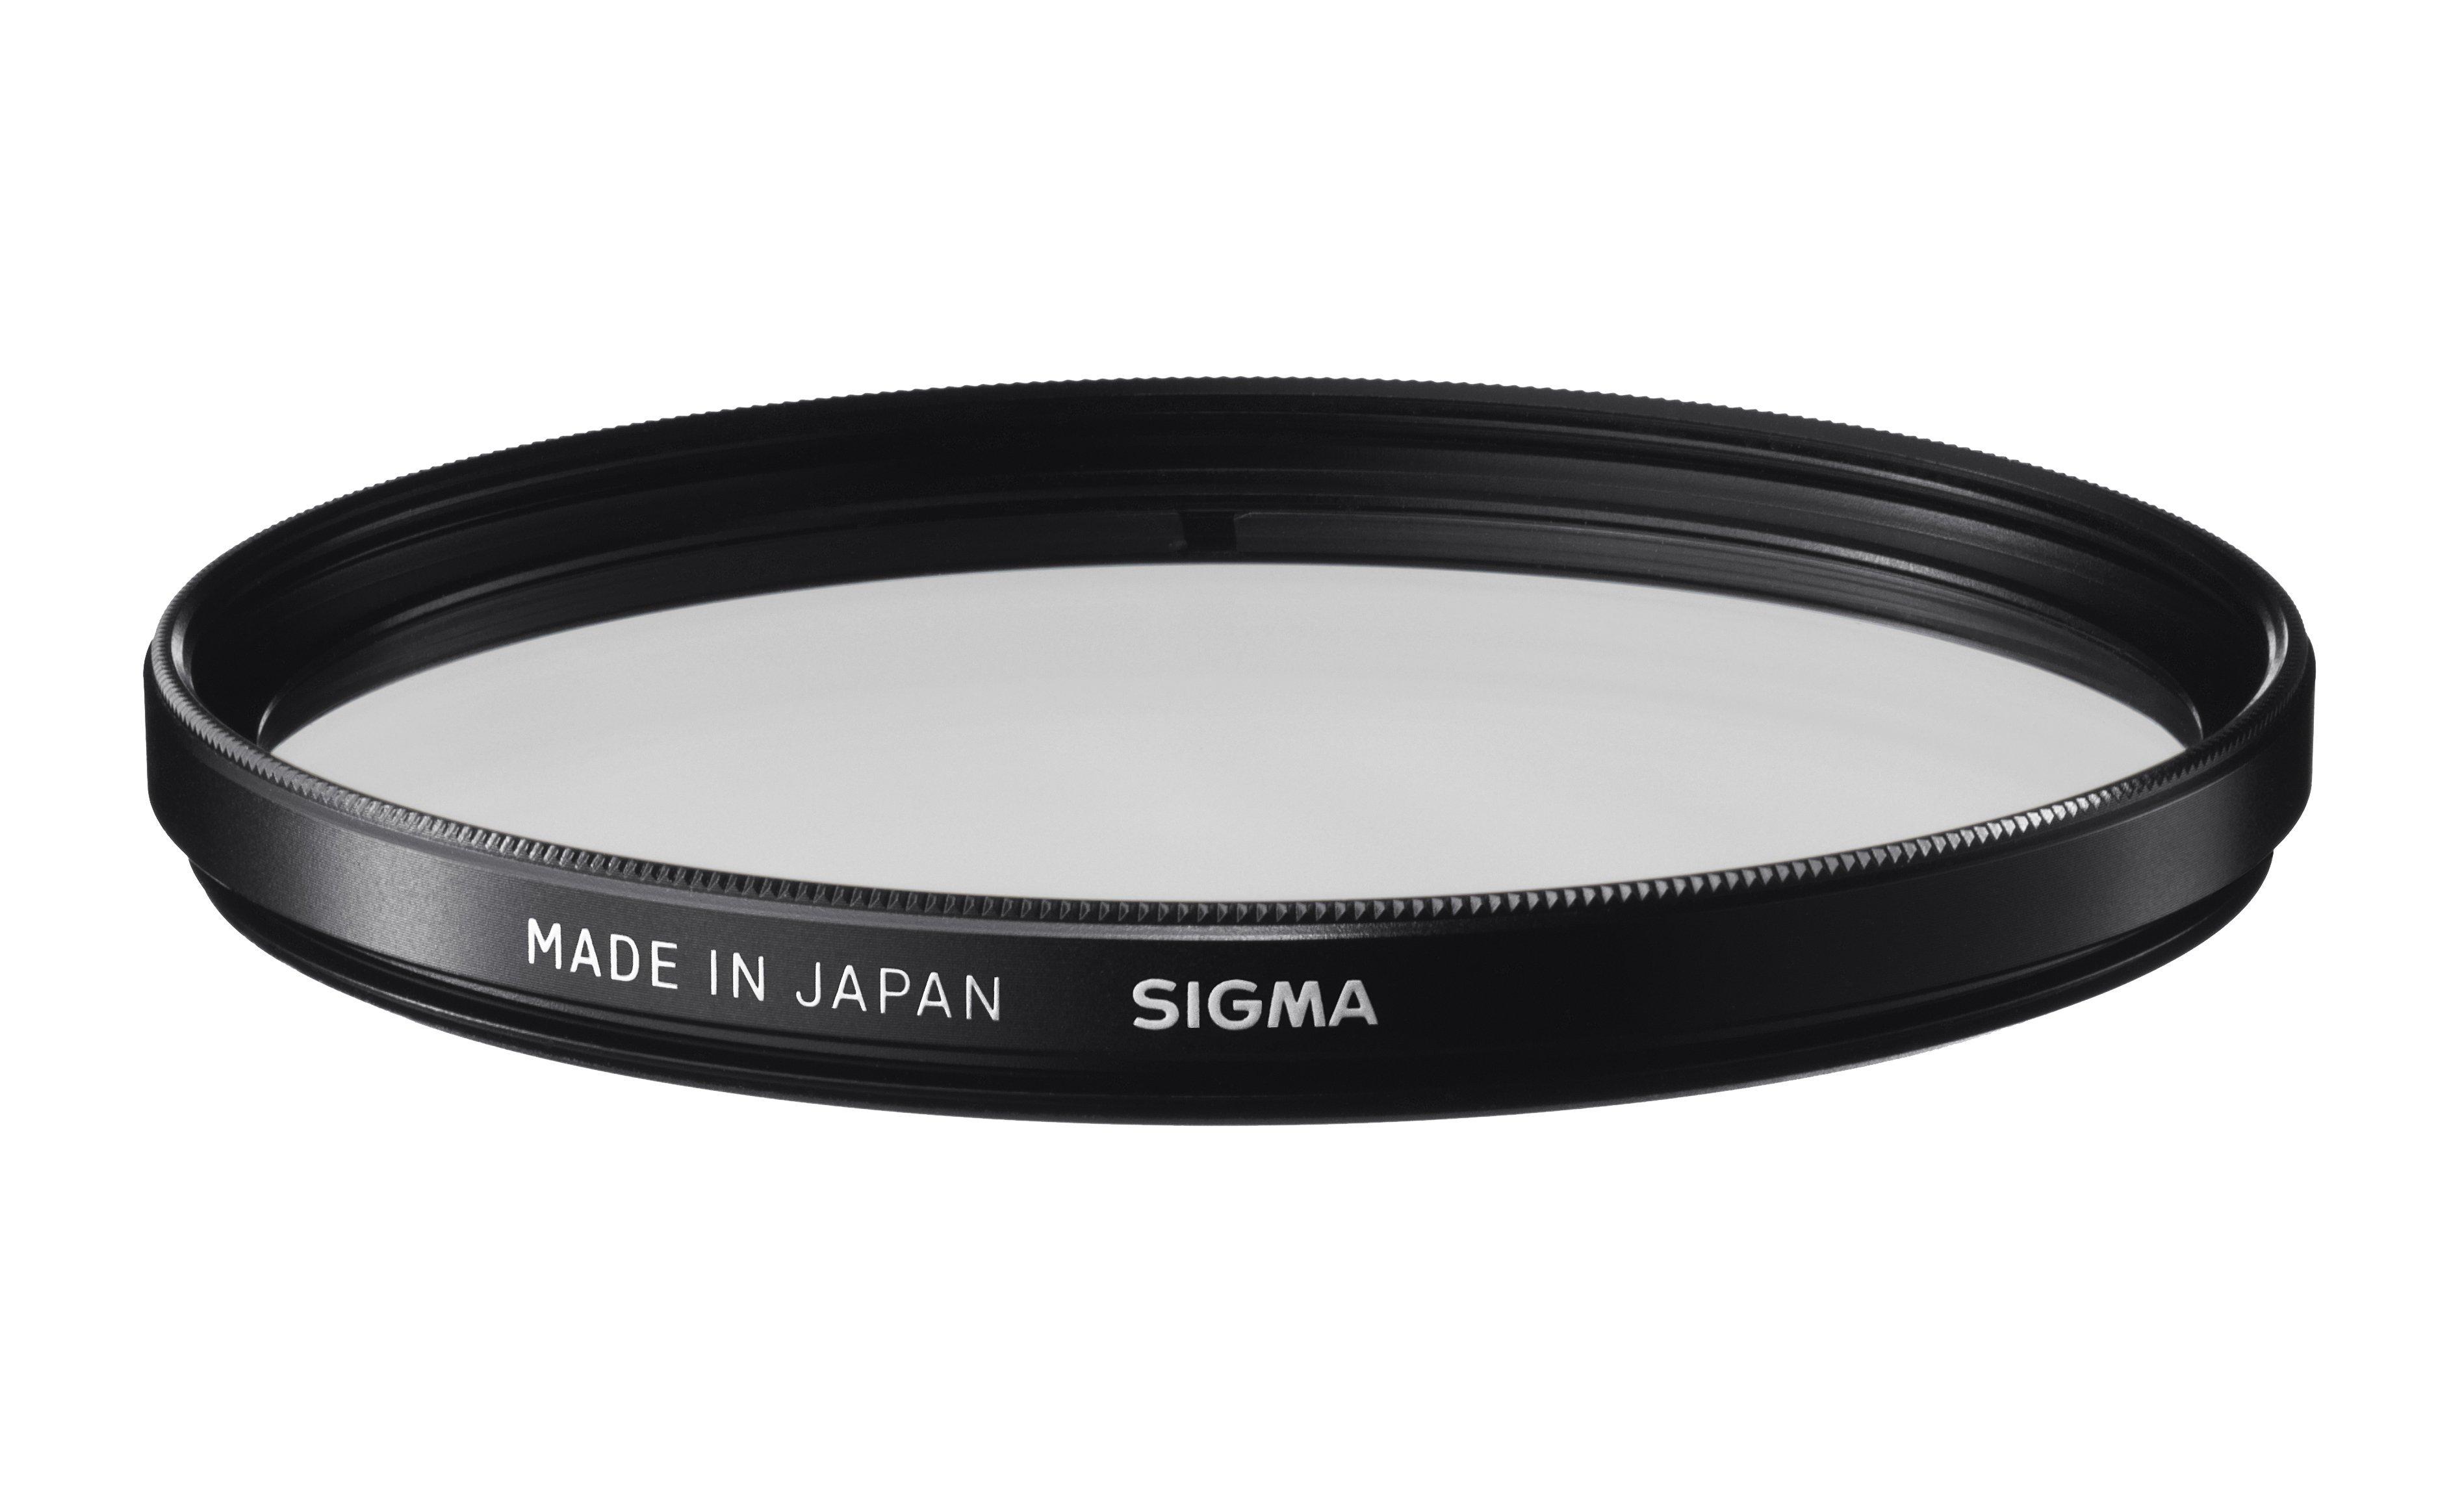 SIGMA filtr UV 105 mm WR